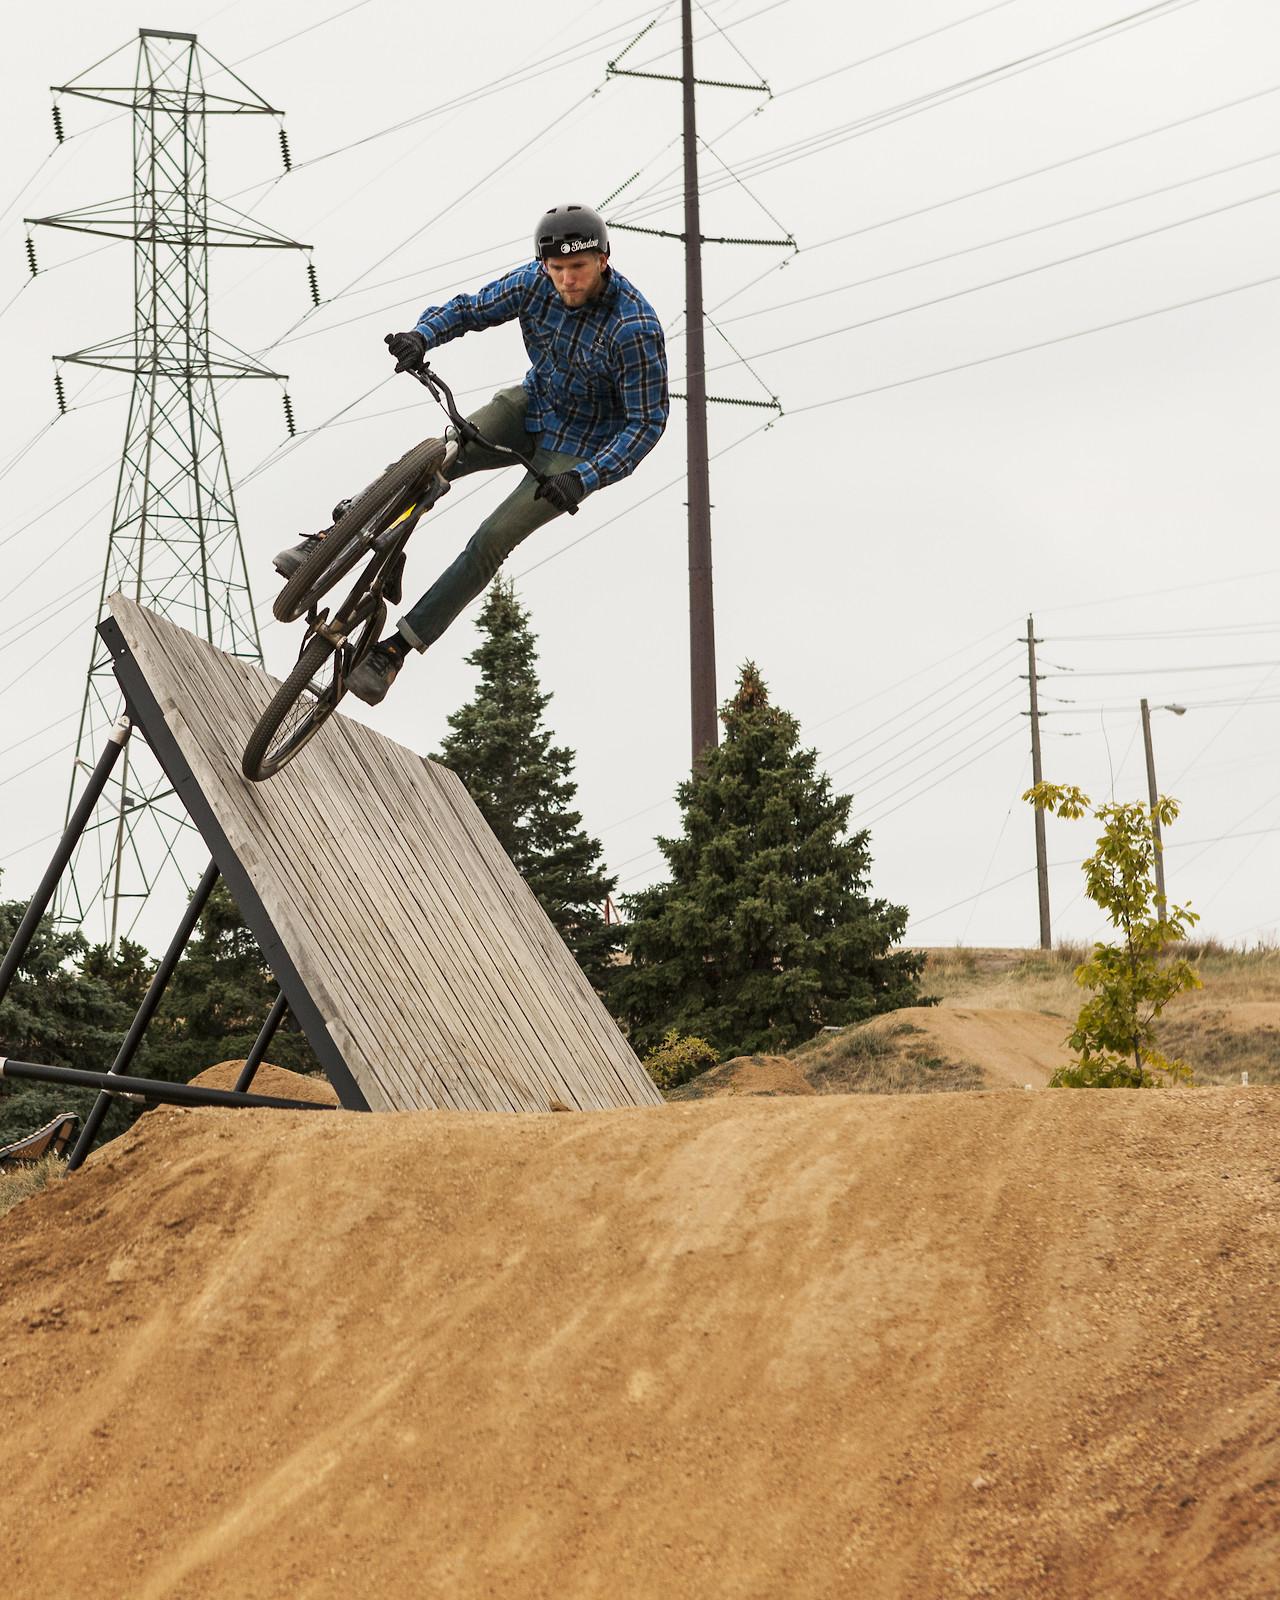 Wall Ride  - ur_pal_al - Mountain Biking Pictures - Vital MTB